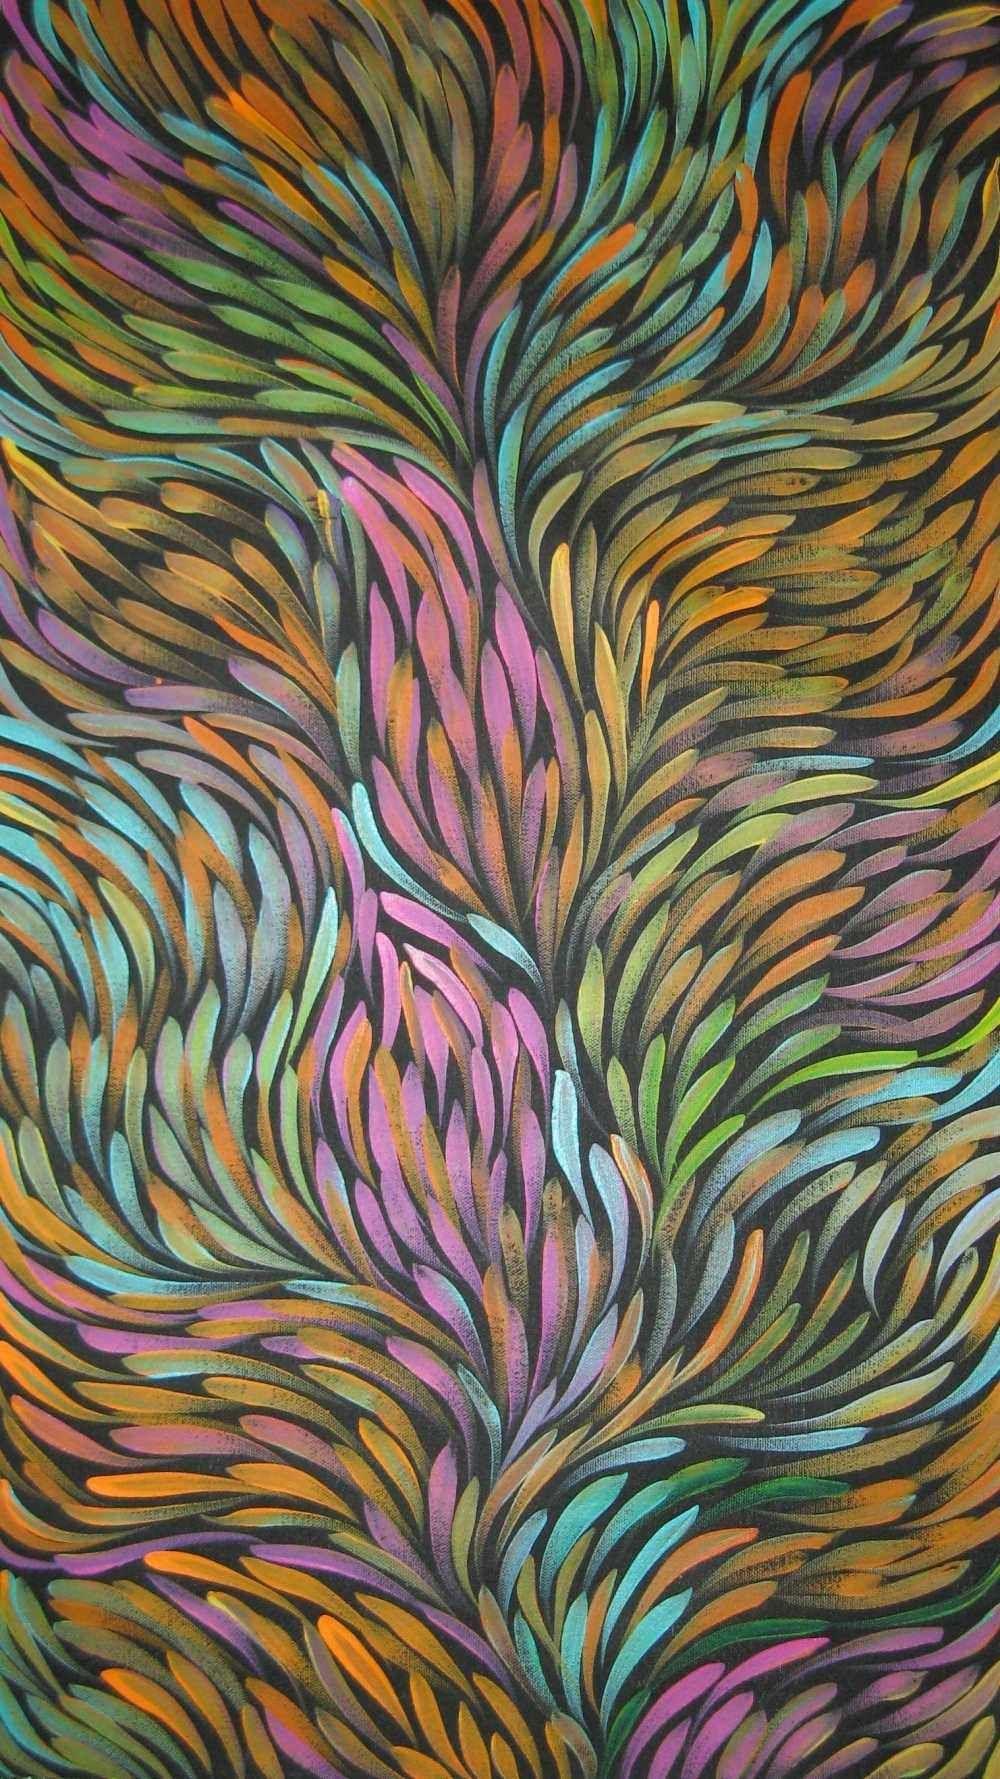 Aboriginal Design Wallpaper : Art australian aboriginal indigenous gloria petyarre